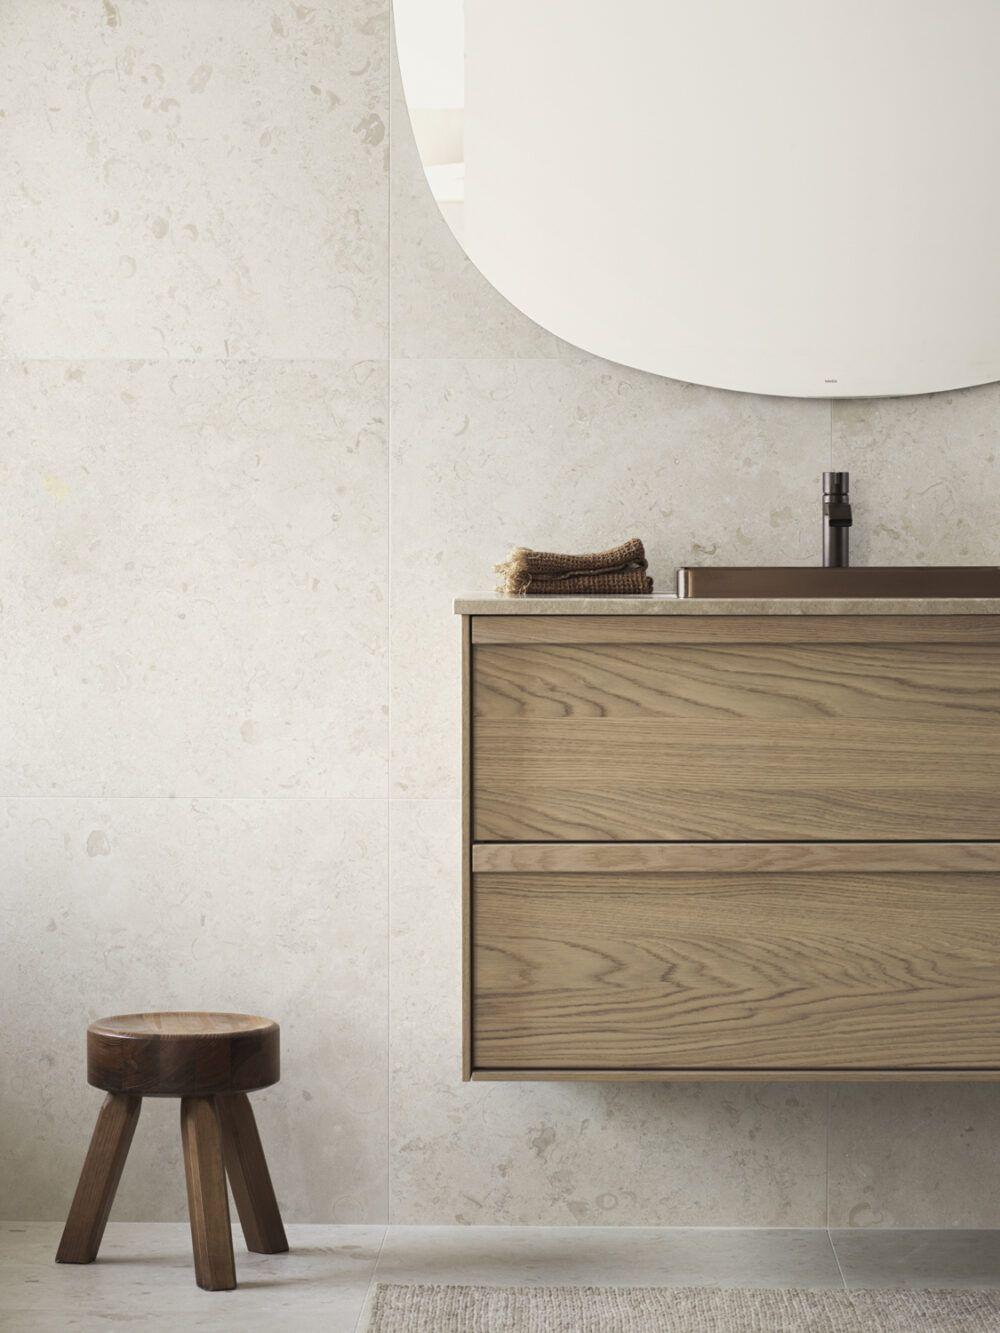 Photo of Beige + Brown bathroom inspiration